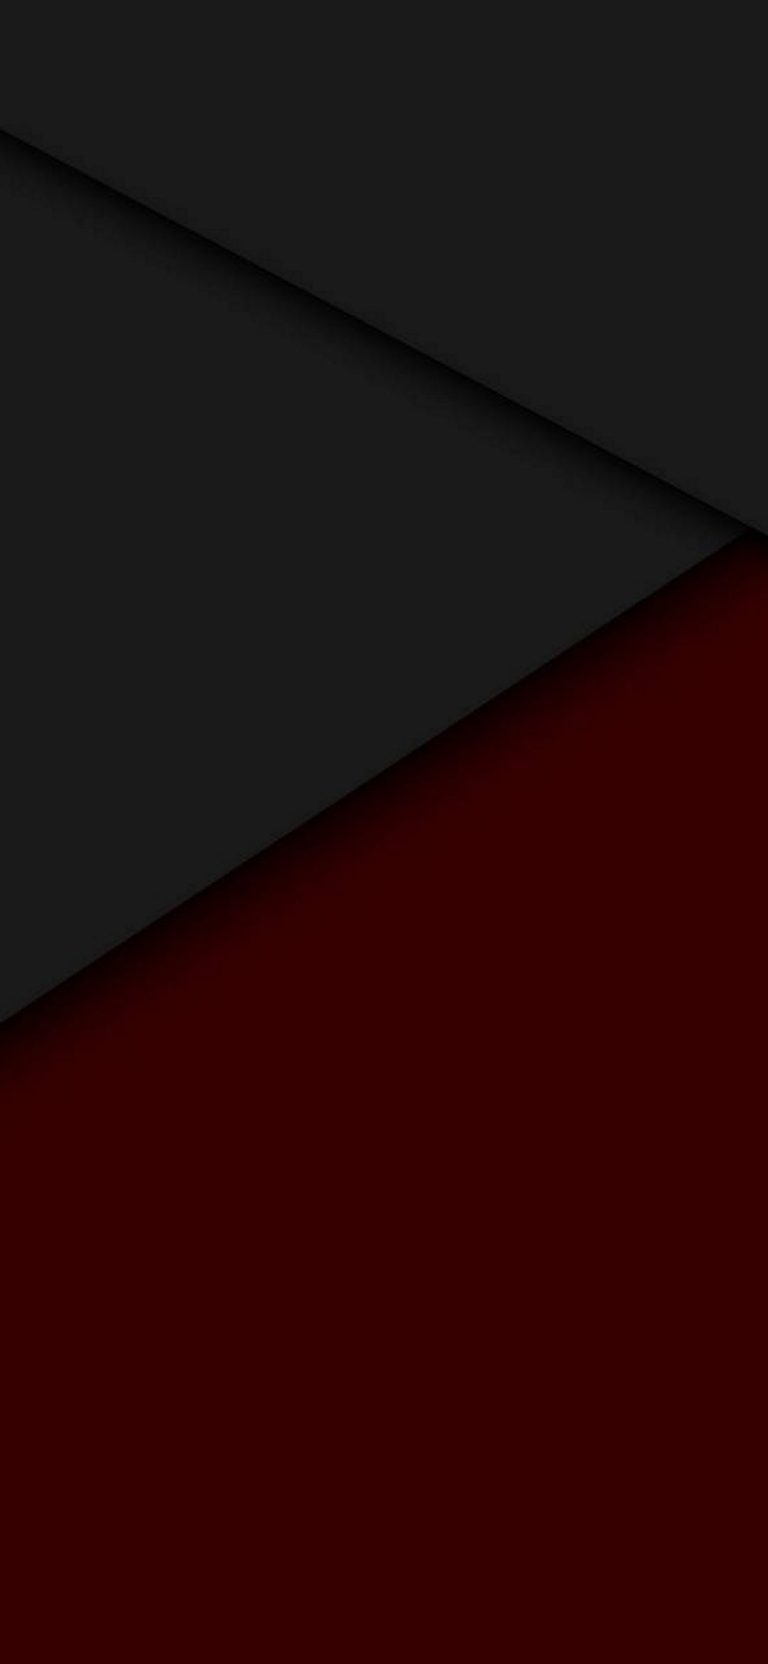 Dark Phone Wallpaper 008 1080x2340 768x1664